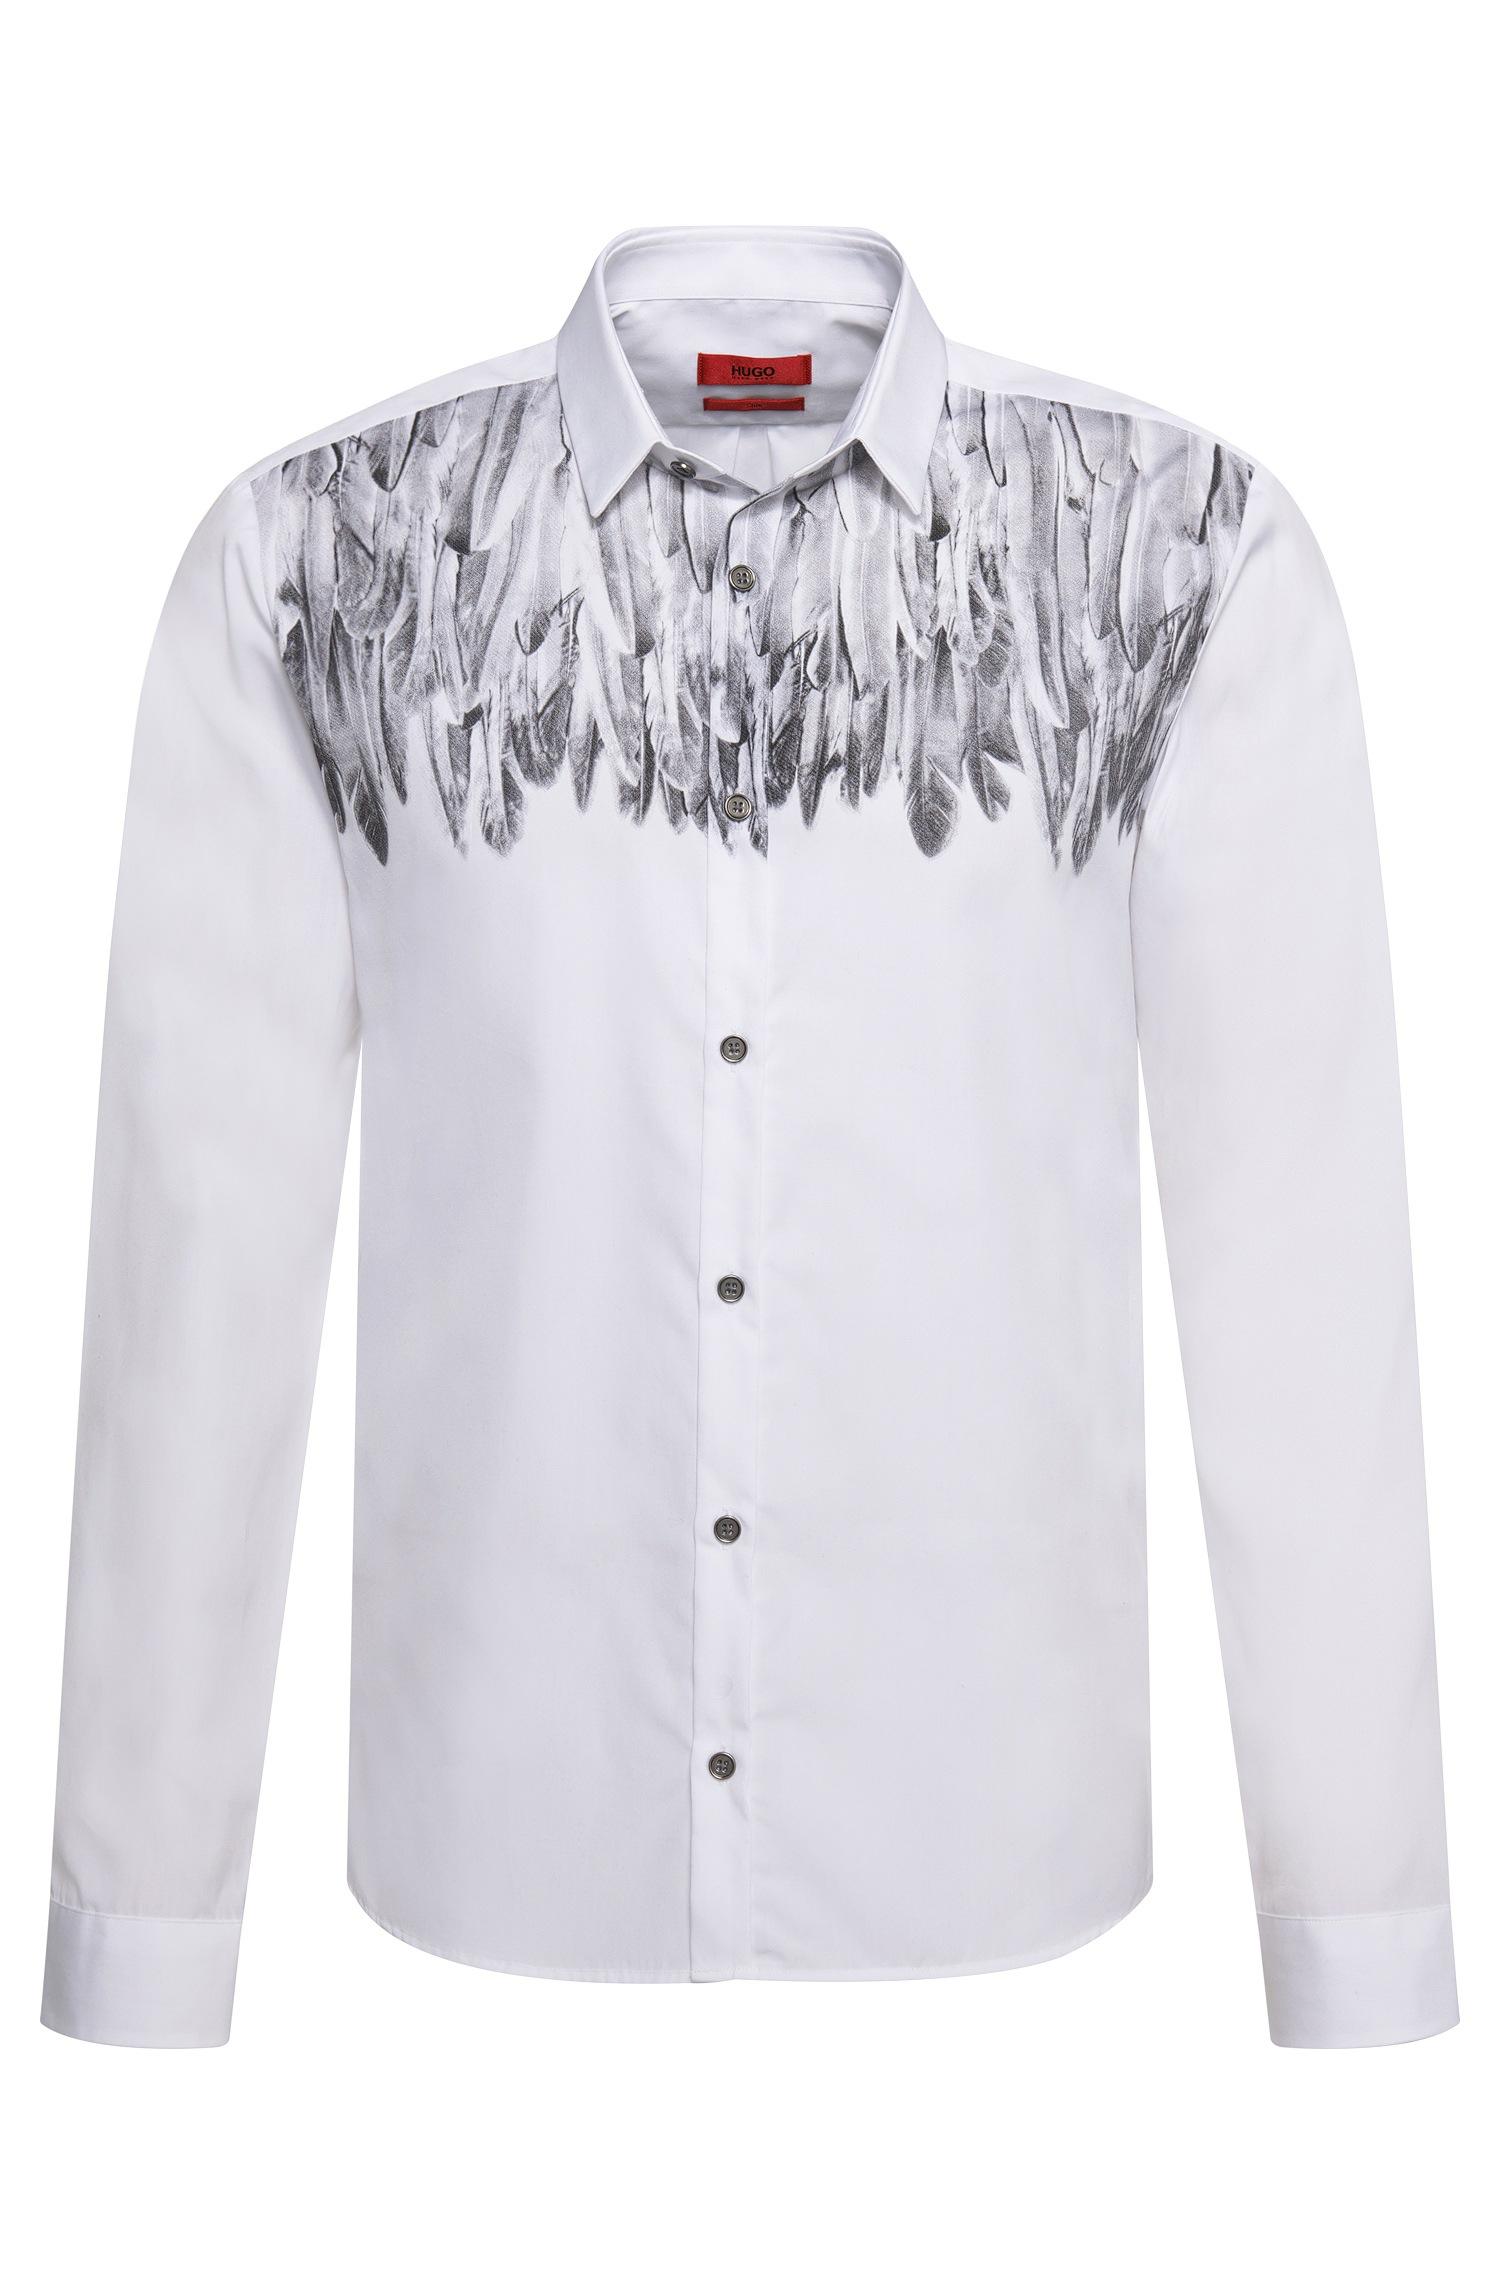 Lyst - Hugo 'ero' | Slim Fit, Cotton Button Down Shirt in White ...